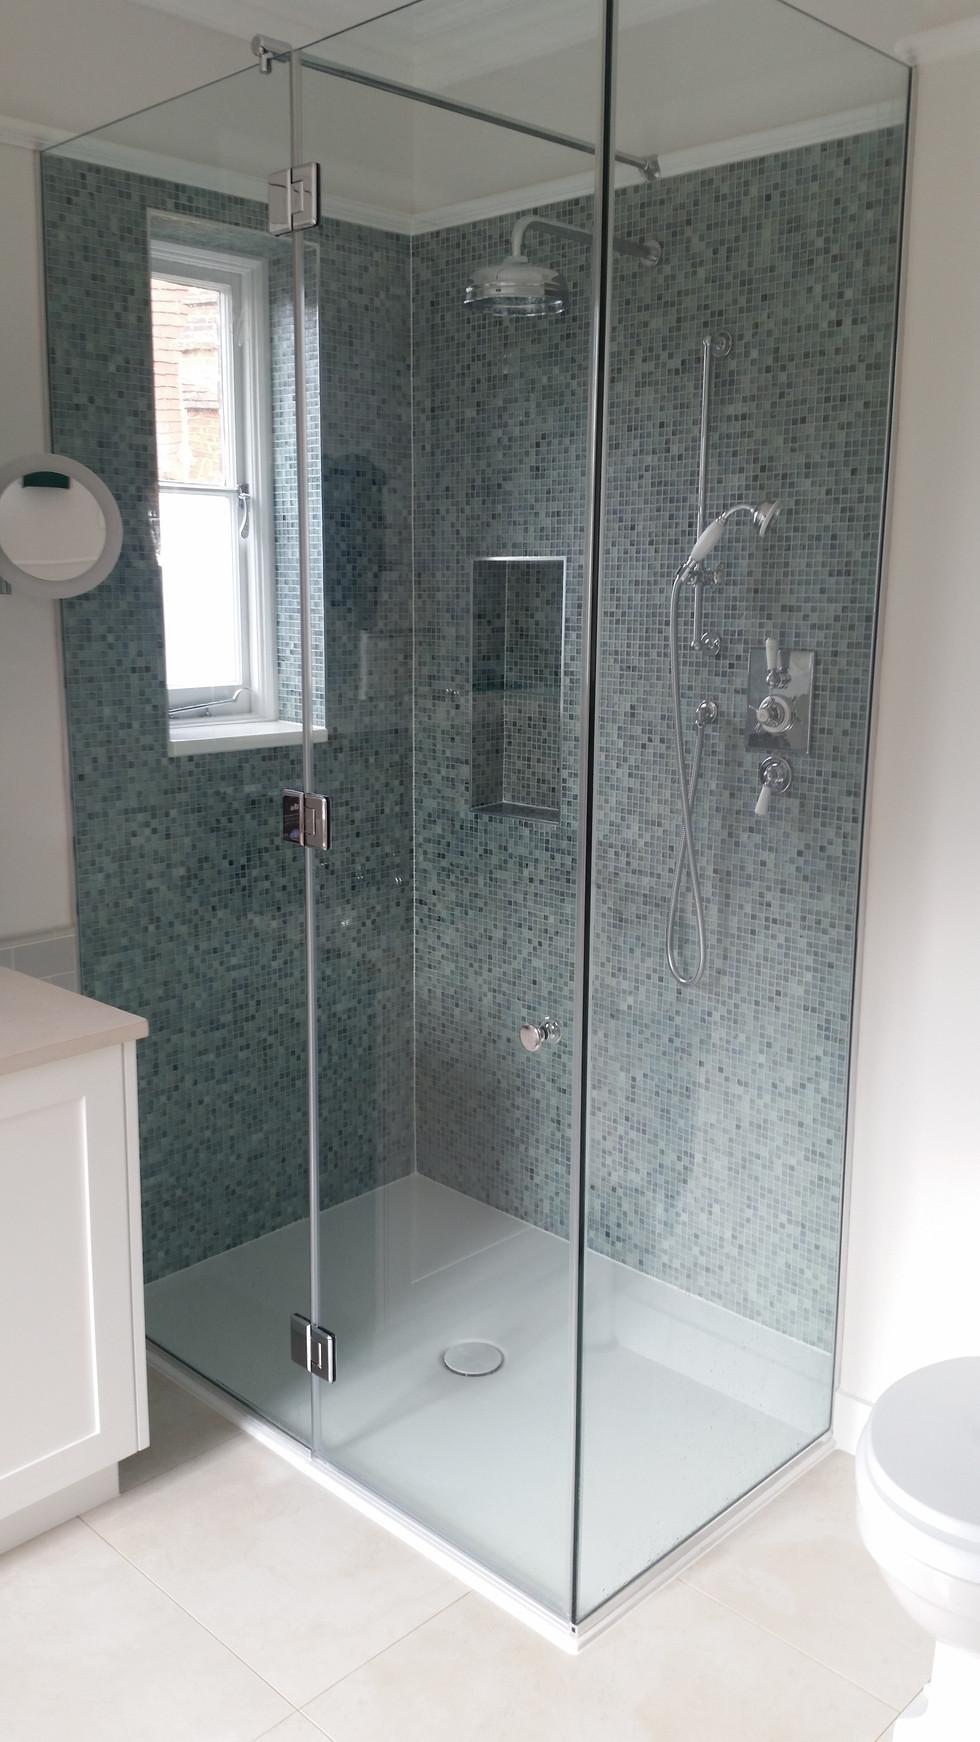 Glass Mosaic Walk-in Shower